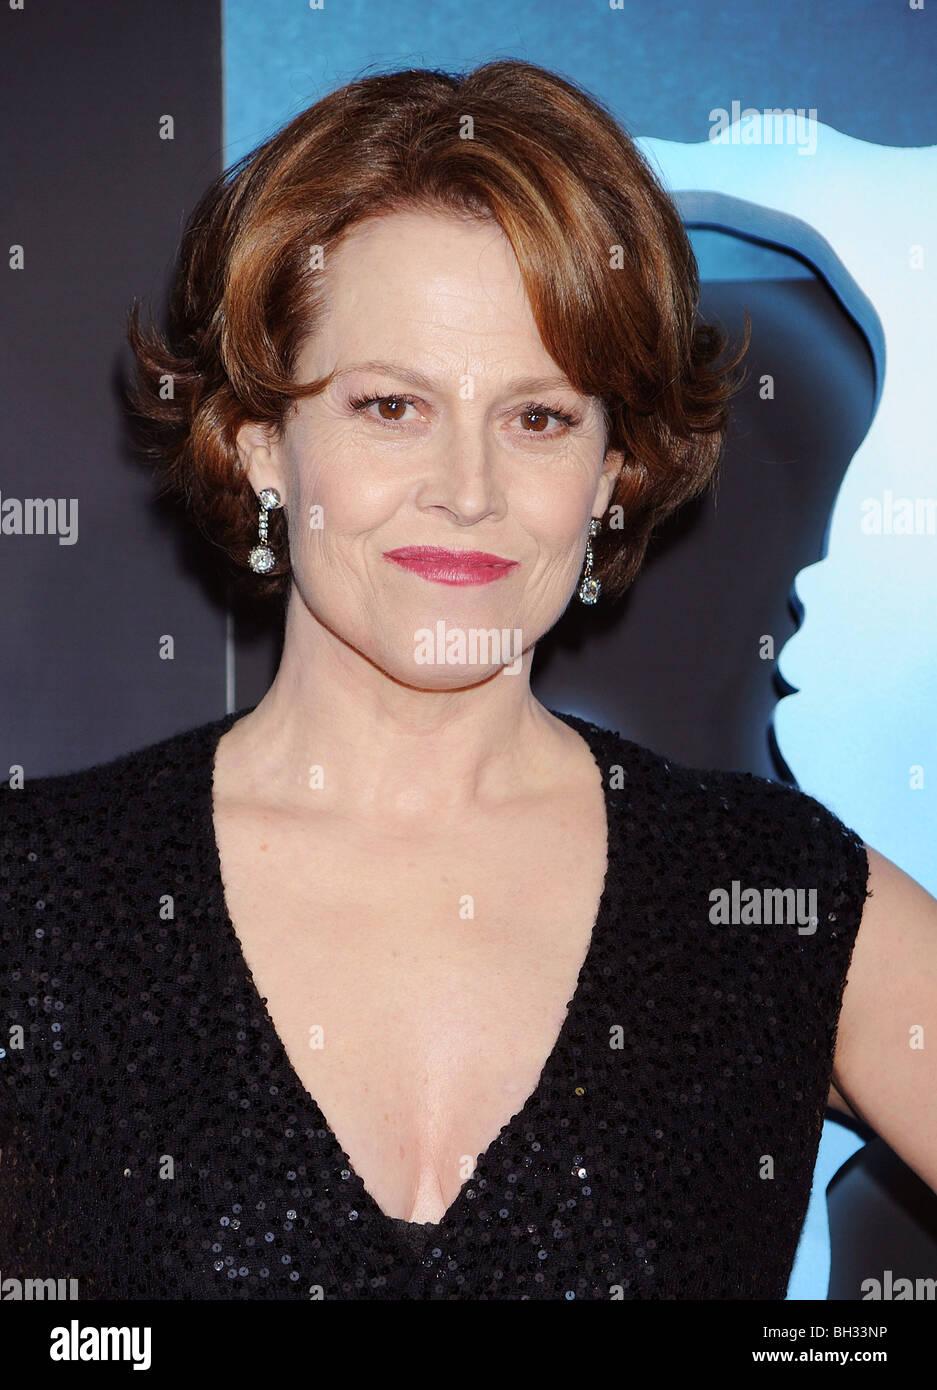 SIGOURNEY WEAVER - US film actress in December 2009 - Stock Image